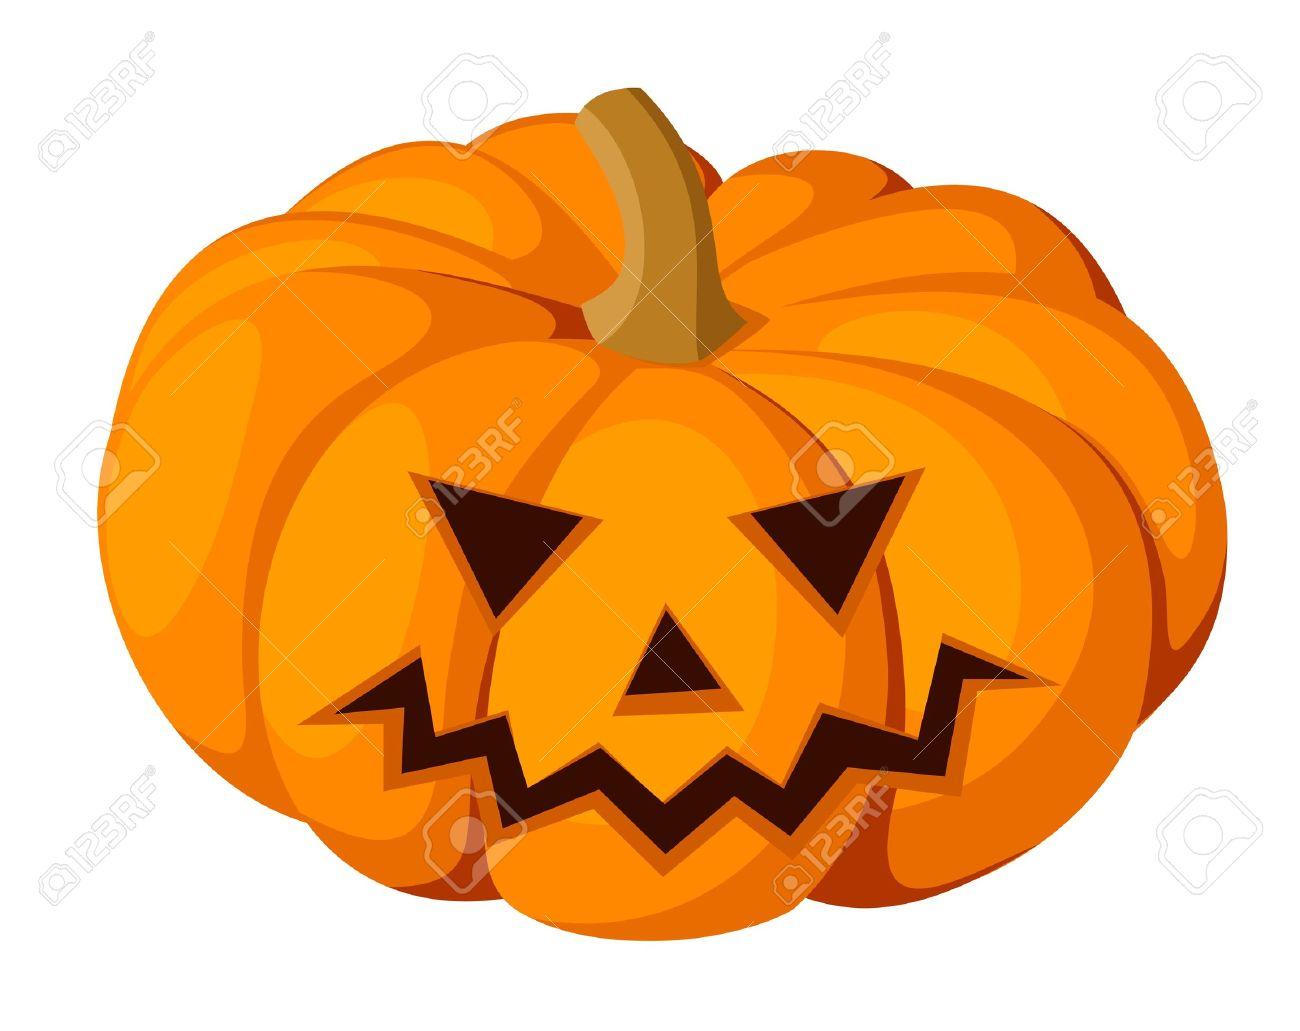 Halloween Pumpkin Vector Art.Jack O Lantern Halloween Pumpkin Vector Illustration